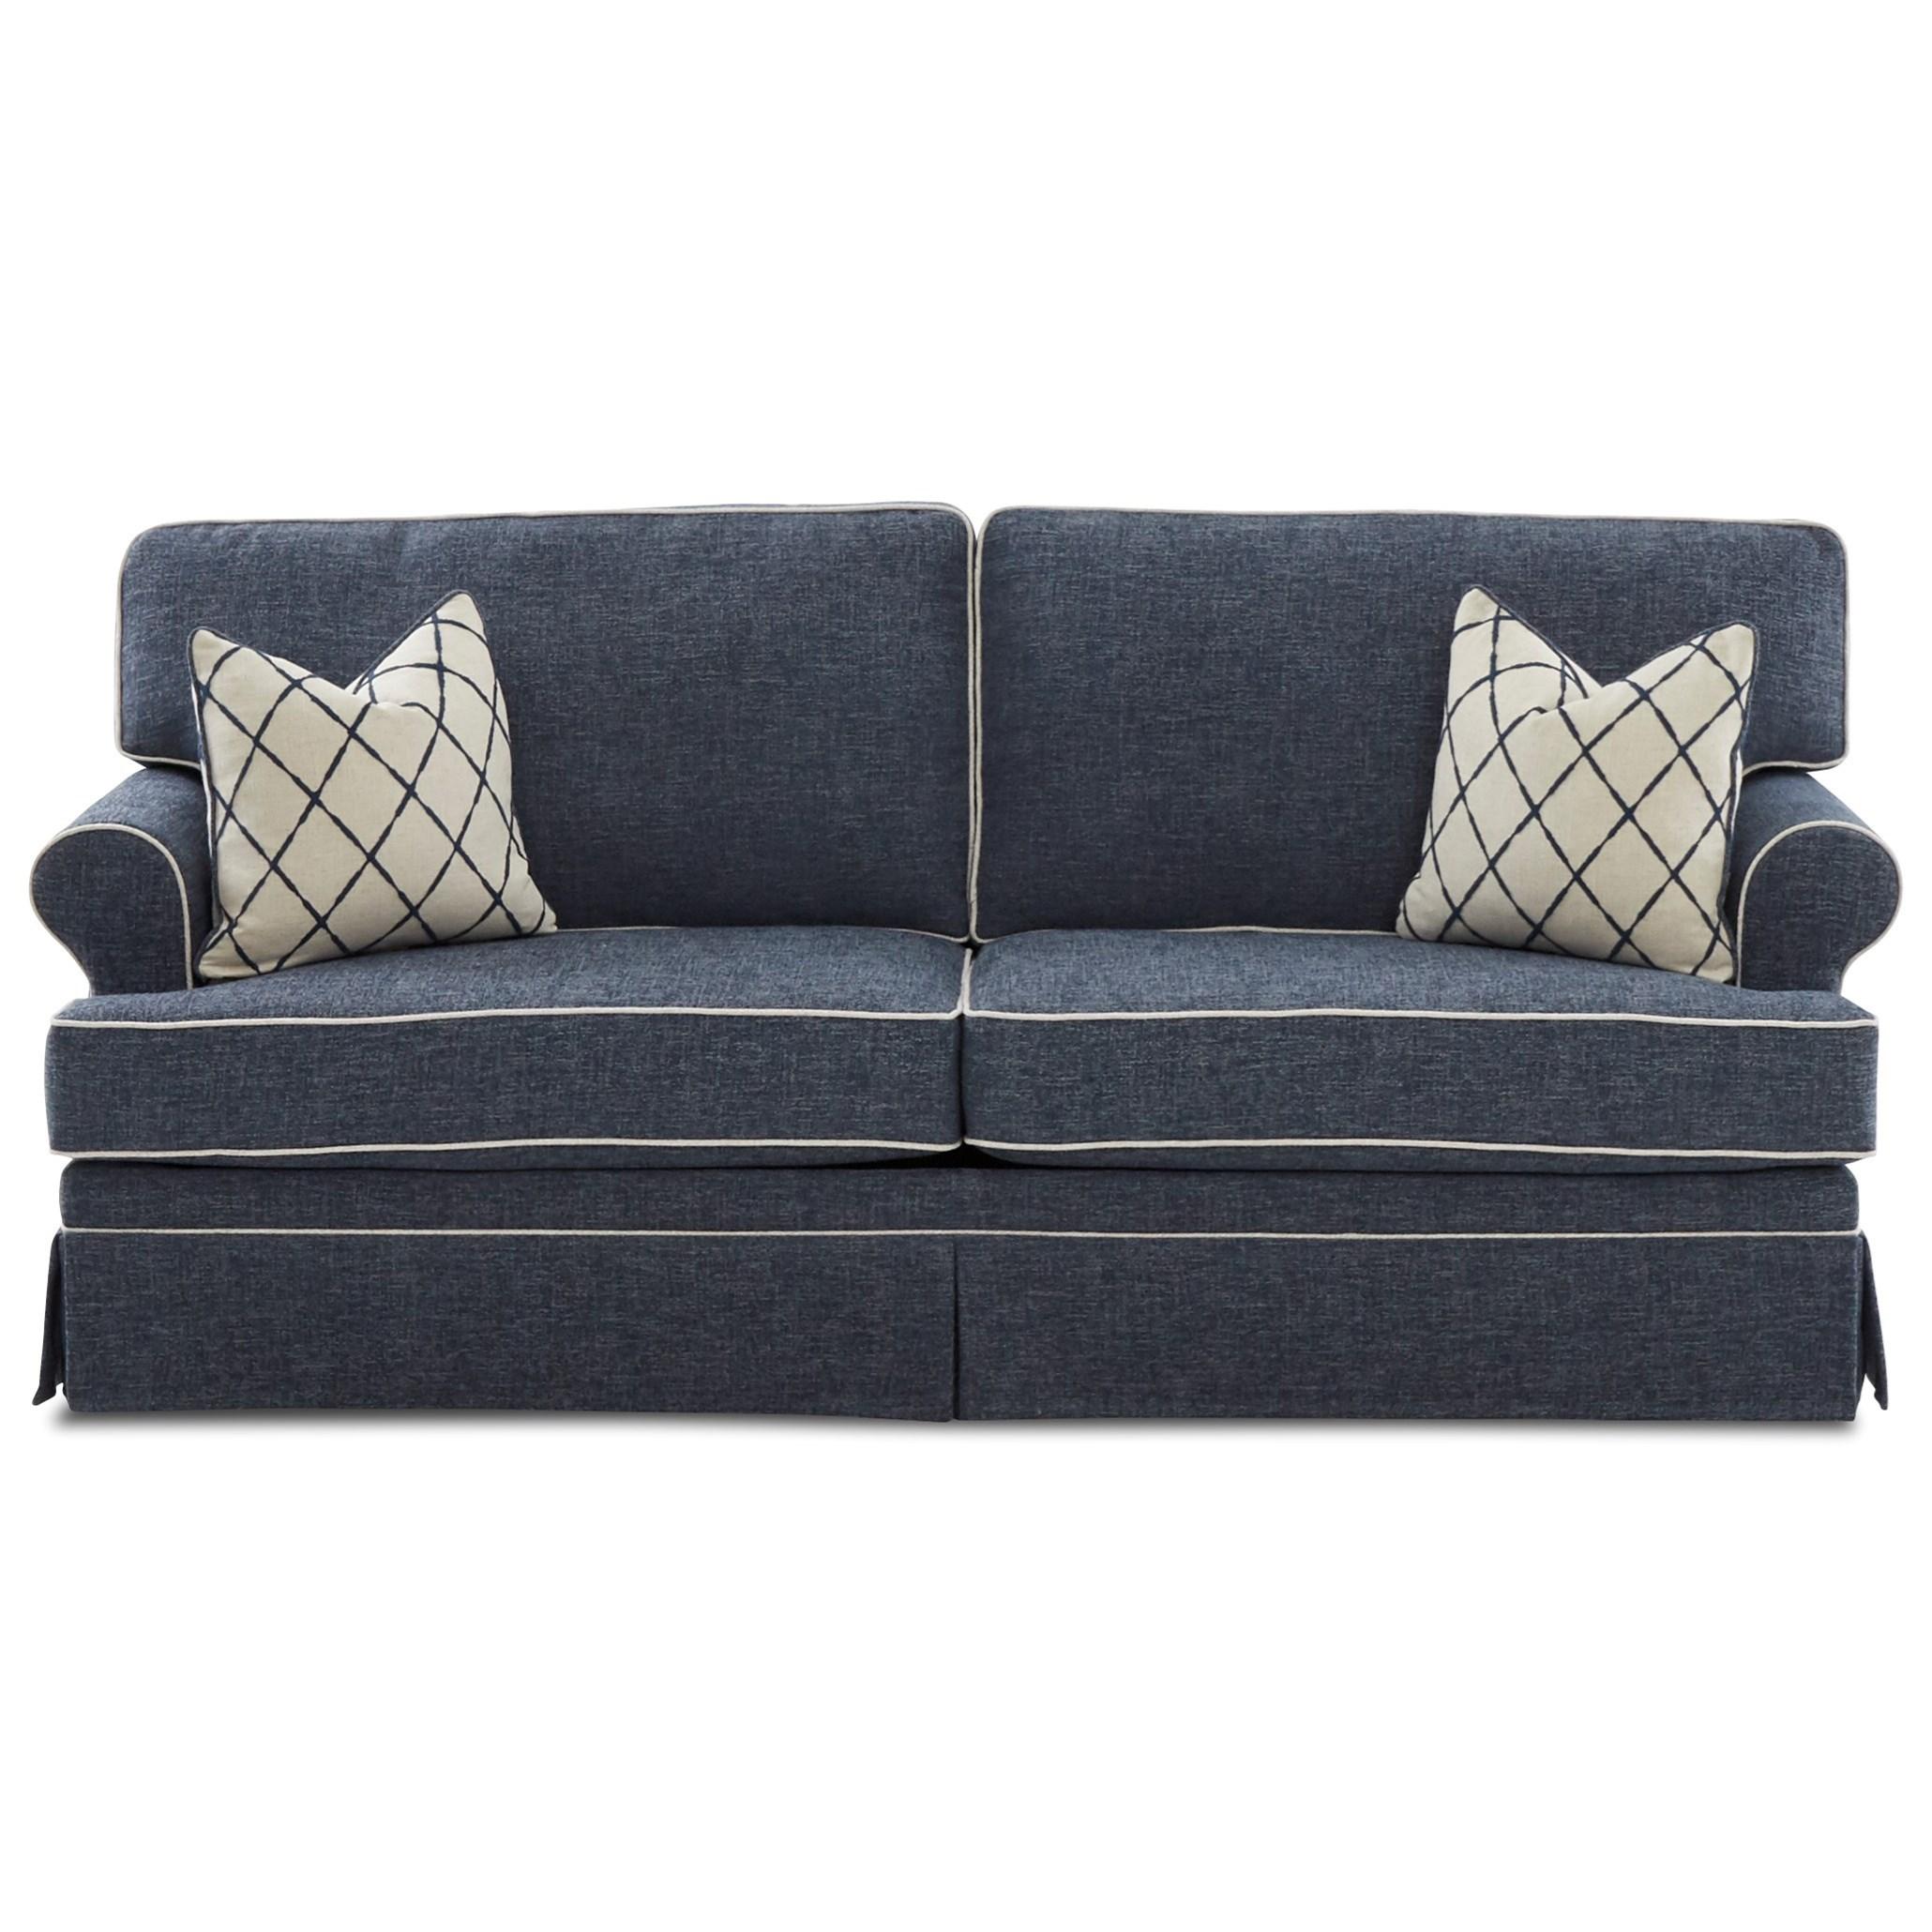 Casual Skirted Sofa Sleeper with Air Coil Mattress